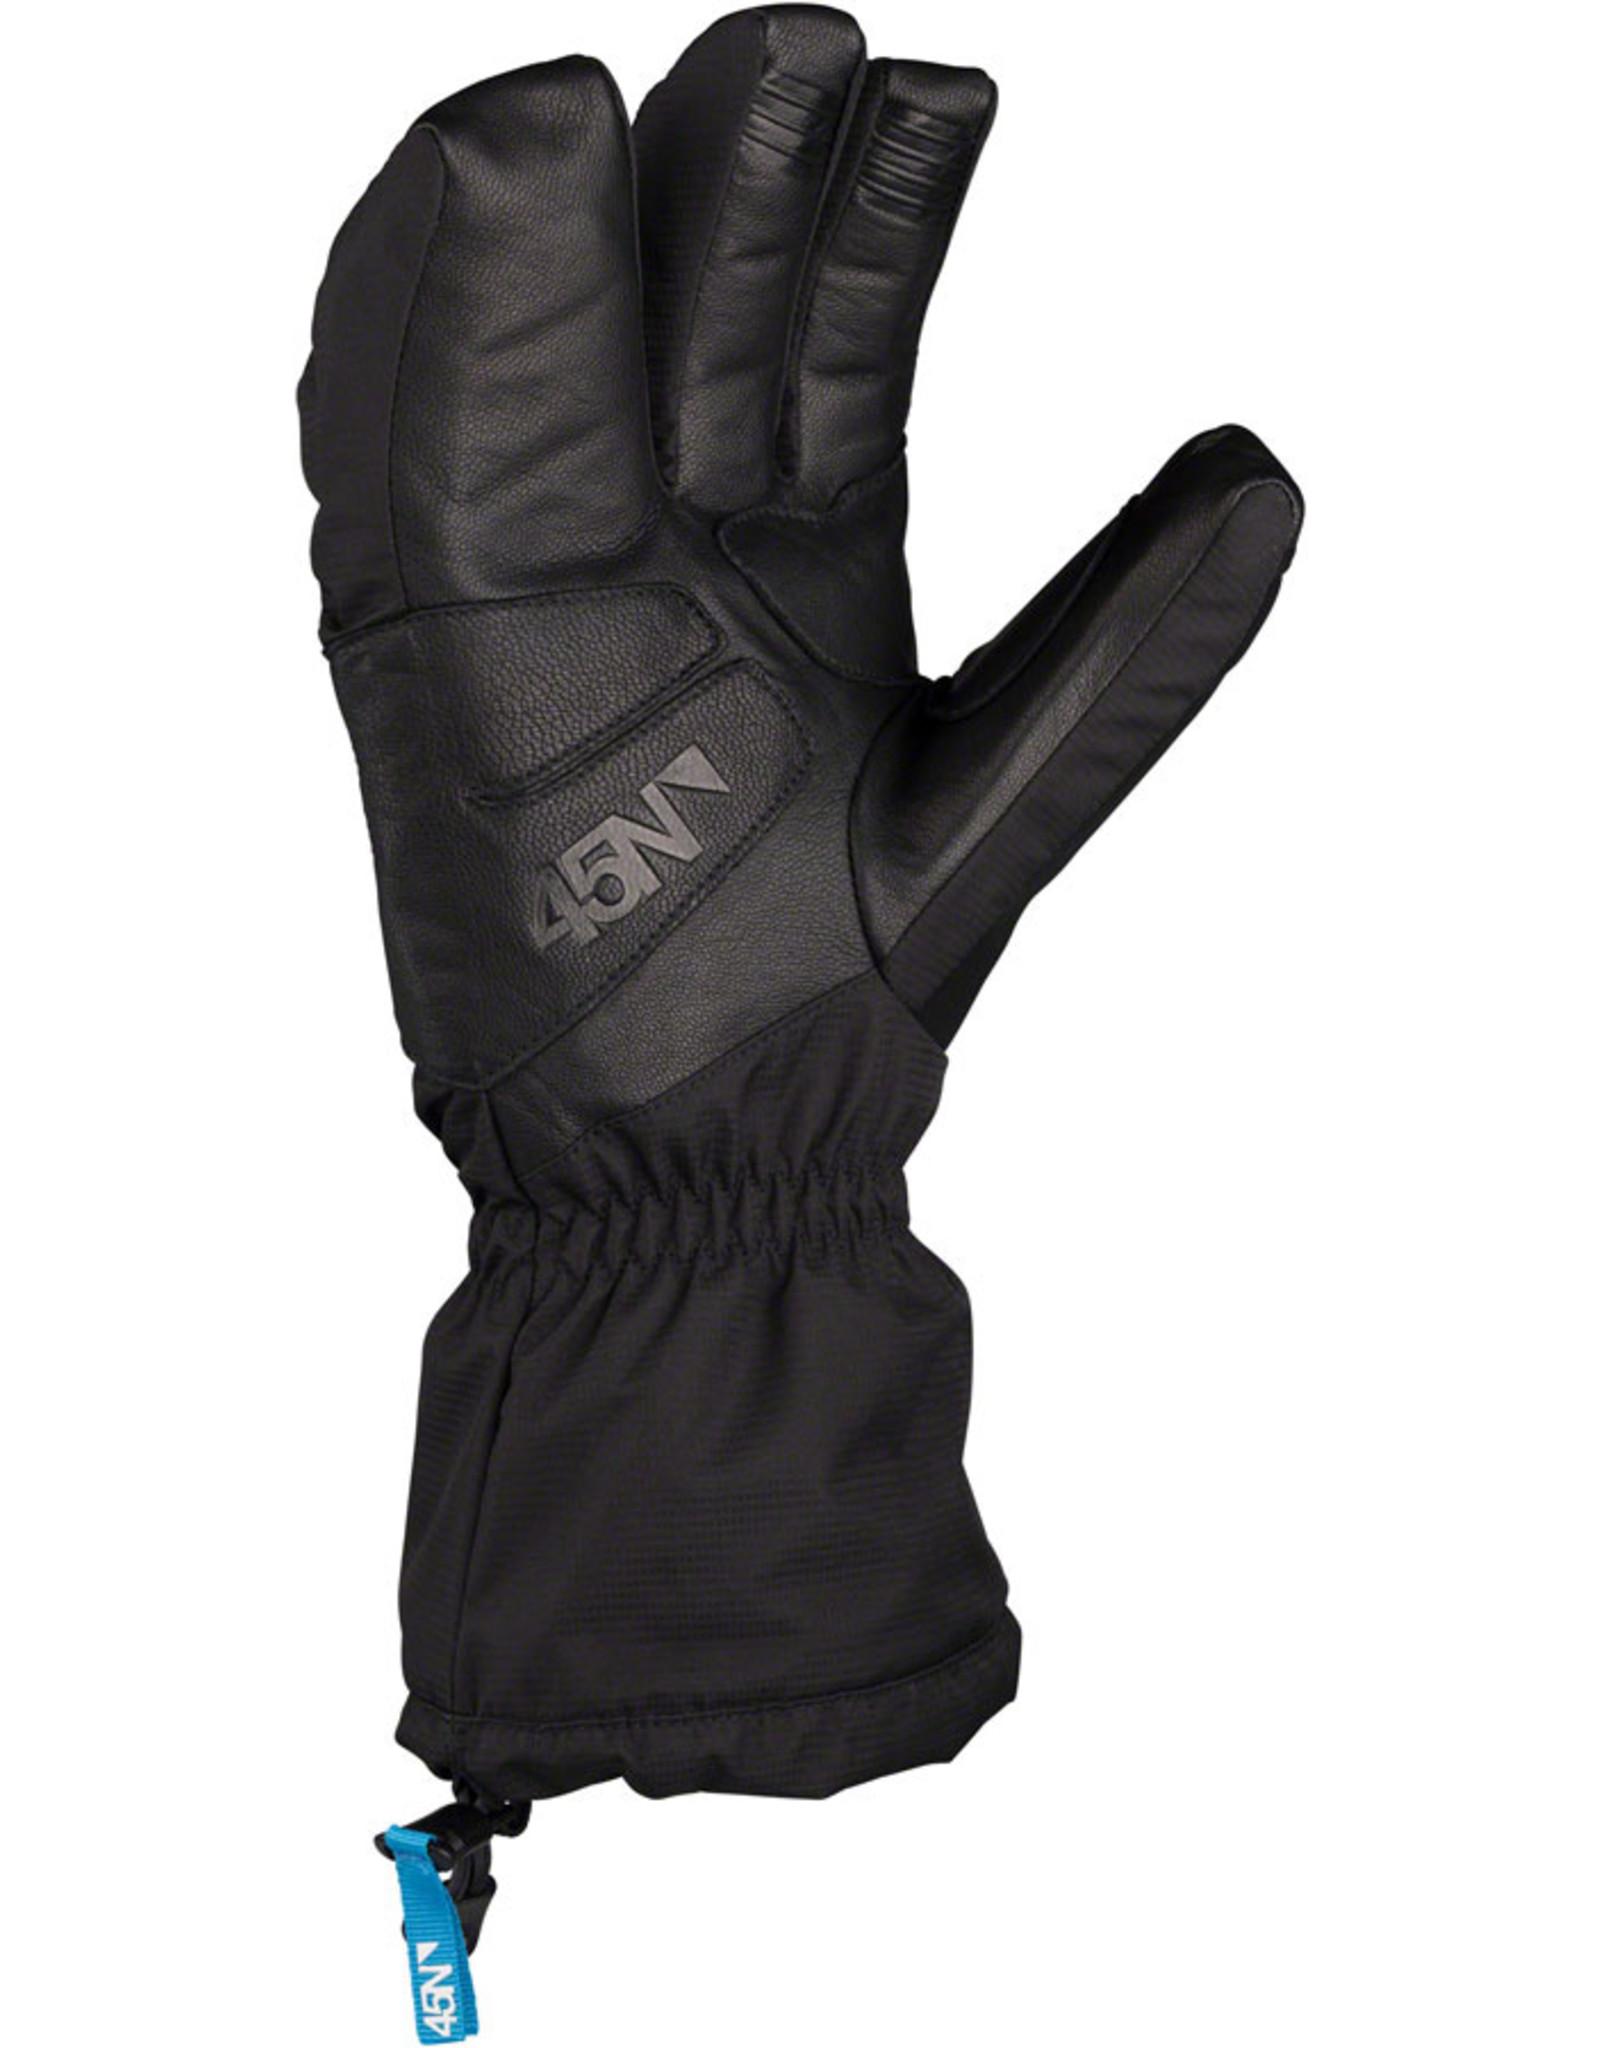 45NRTH 45NRTH Sturmfist 4 Finger Glove: Black LG (9)